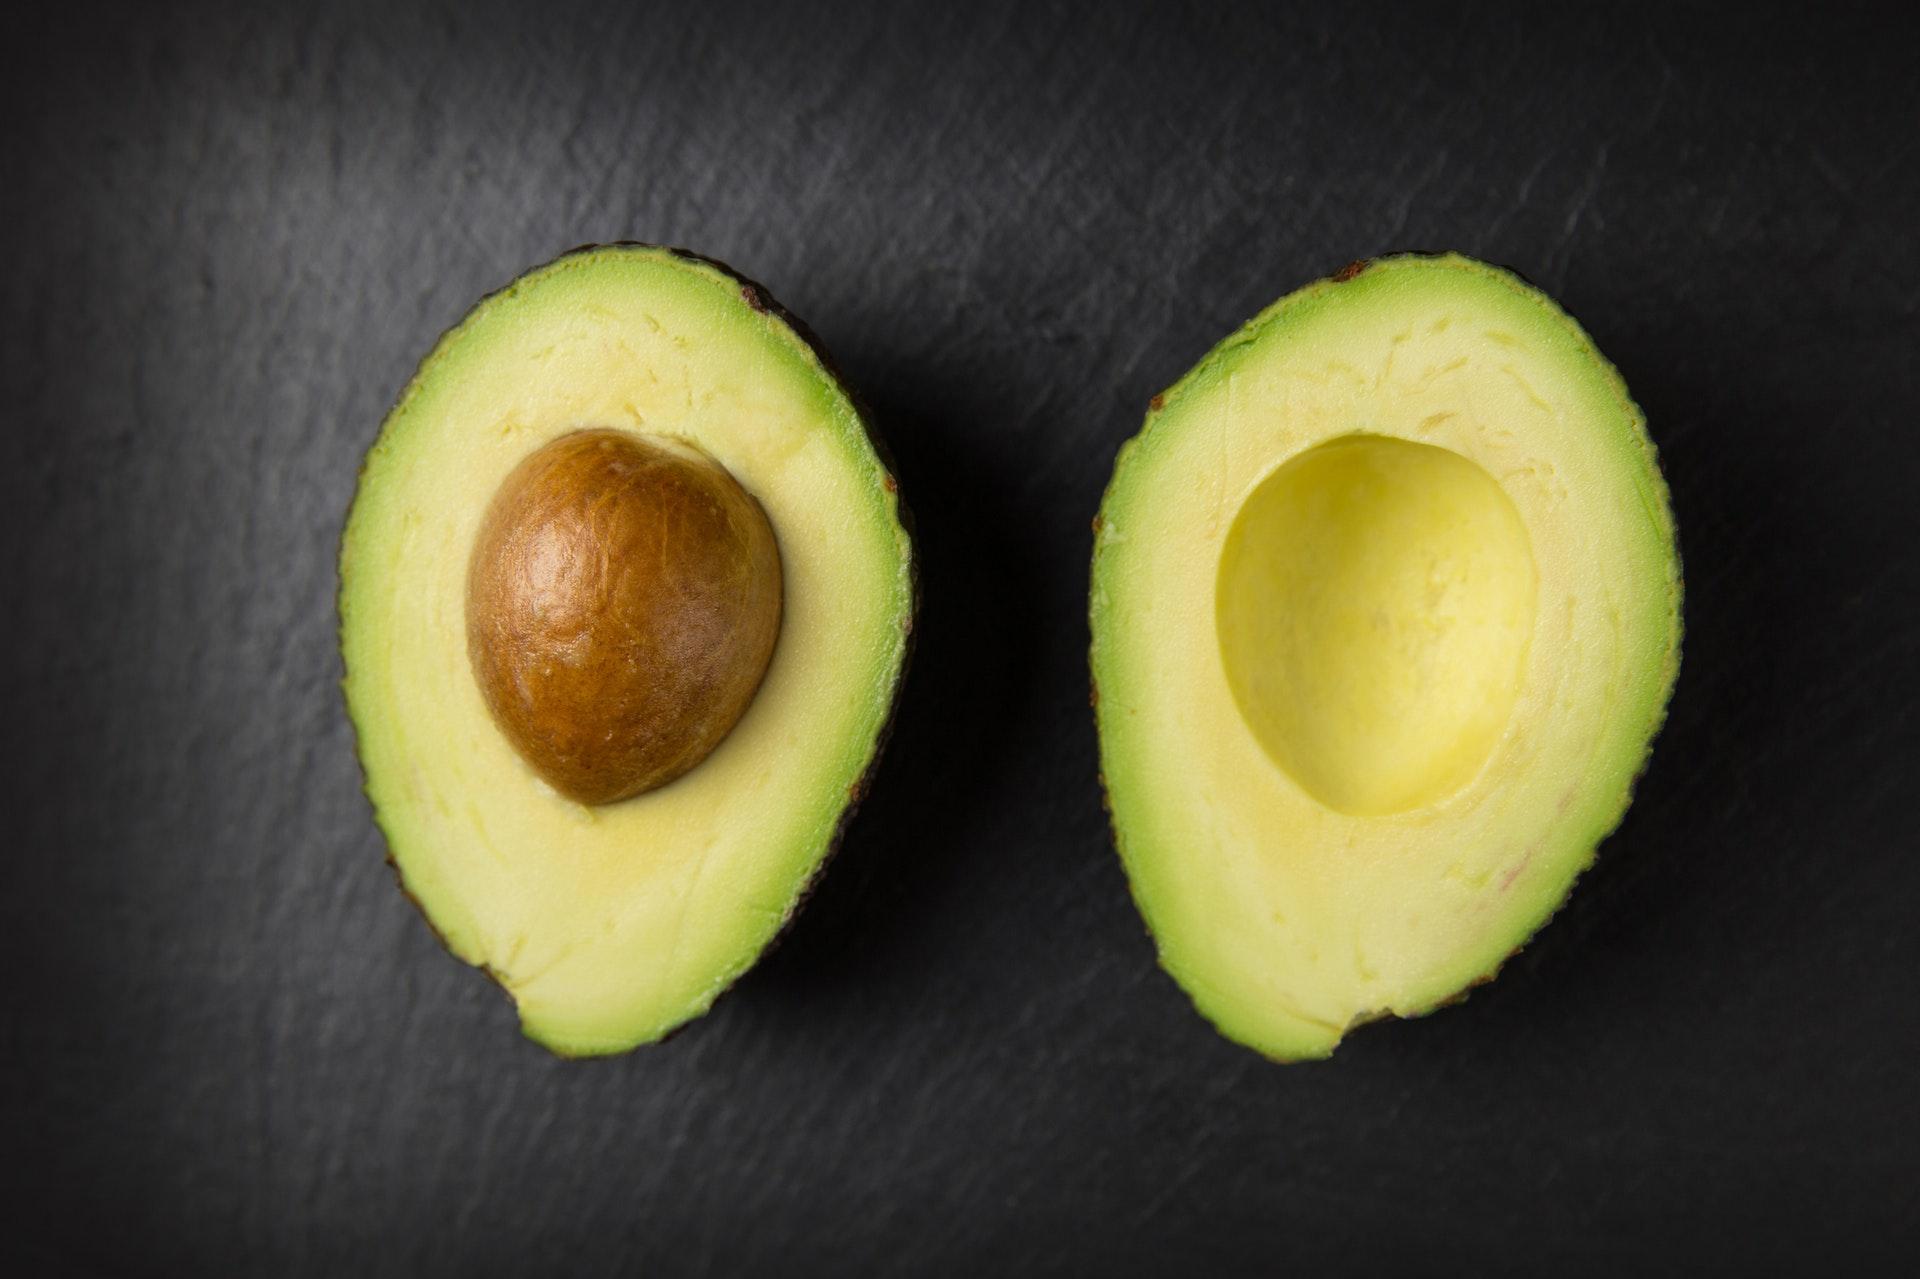 Avocado Season - Eat More (monounsaturated) Fat!